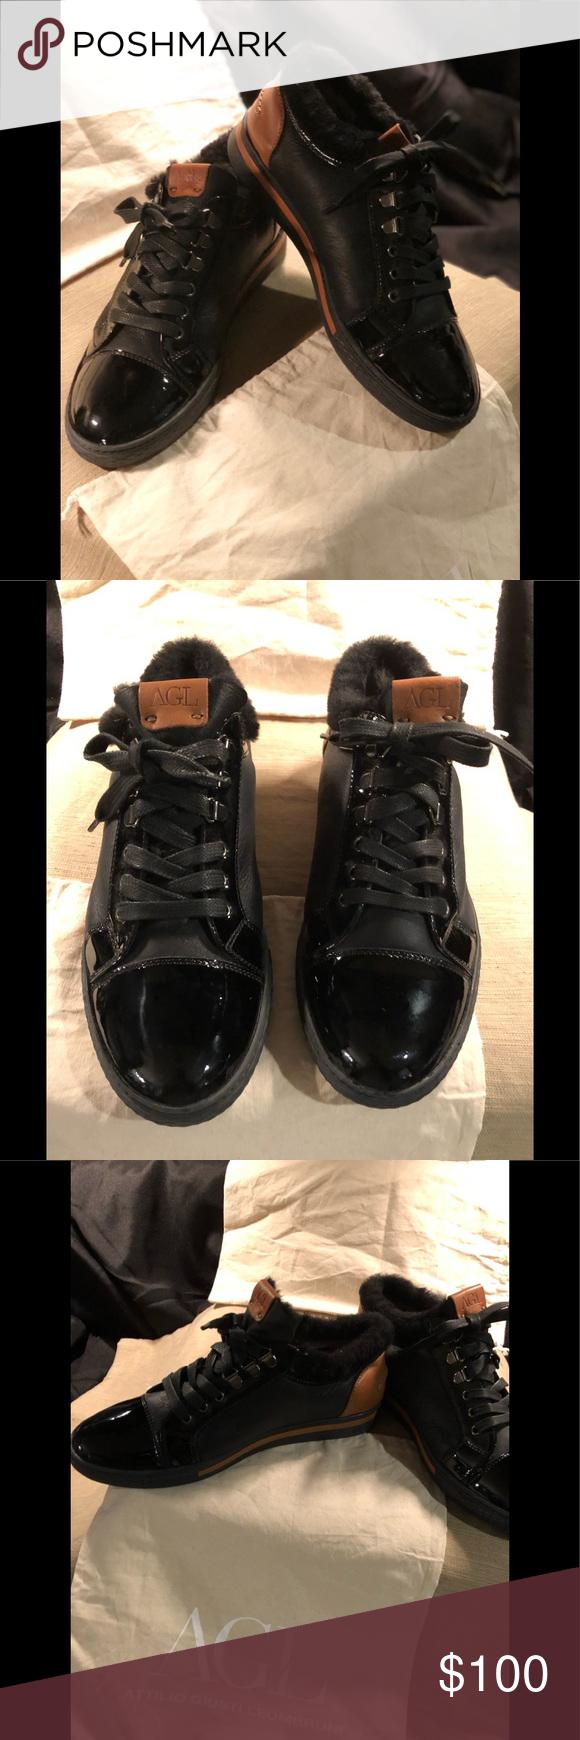 NWOT AGL Tennis Shoes, size 38 (8